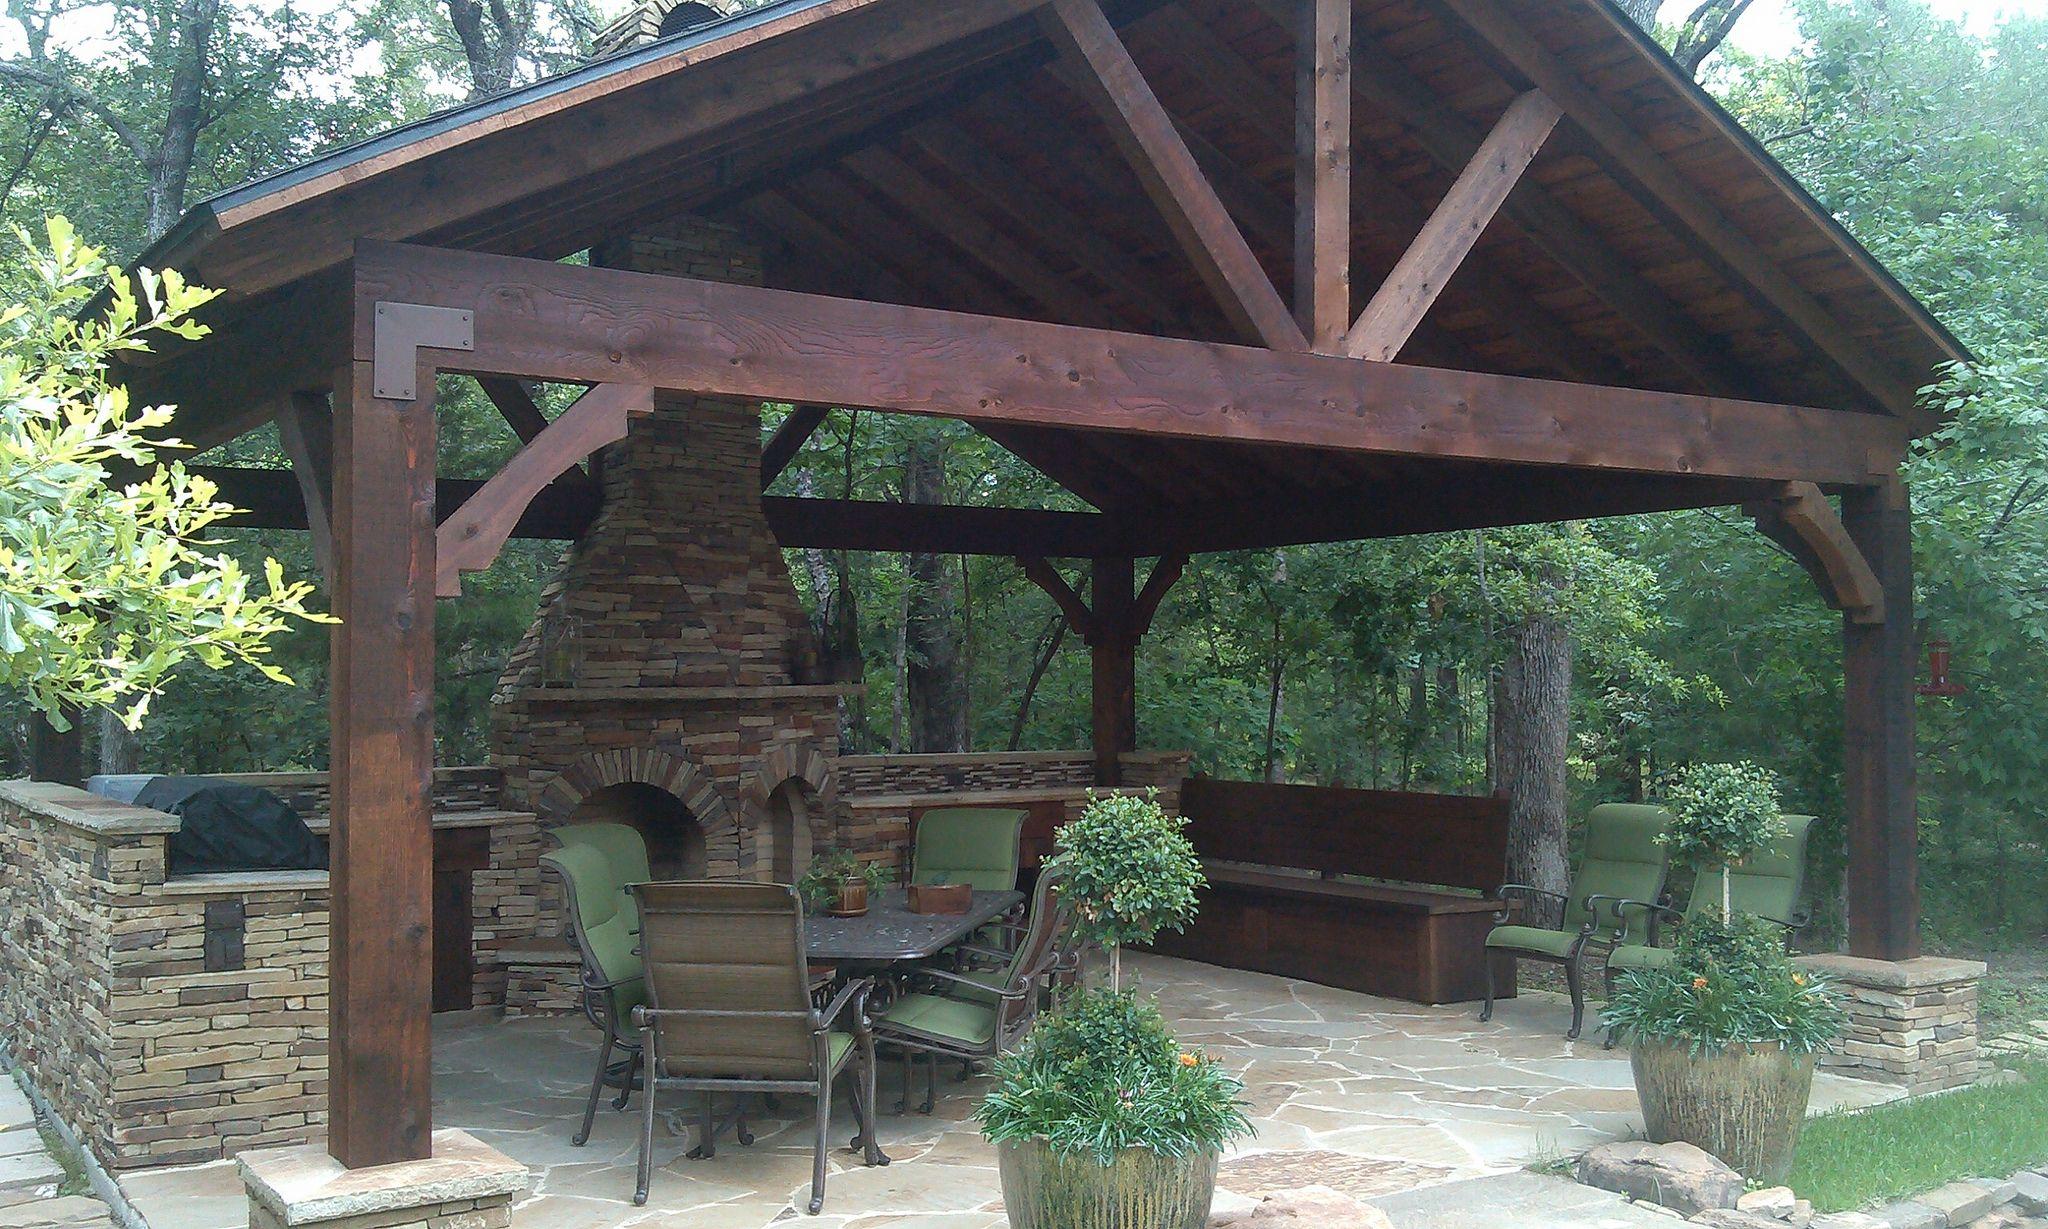 Outdoor Kitchen Install Royse City Tx Outdoor Kitchen Patio Rustic Patio Outdoor Kitchen